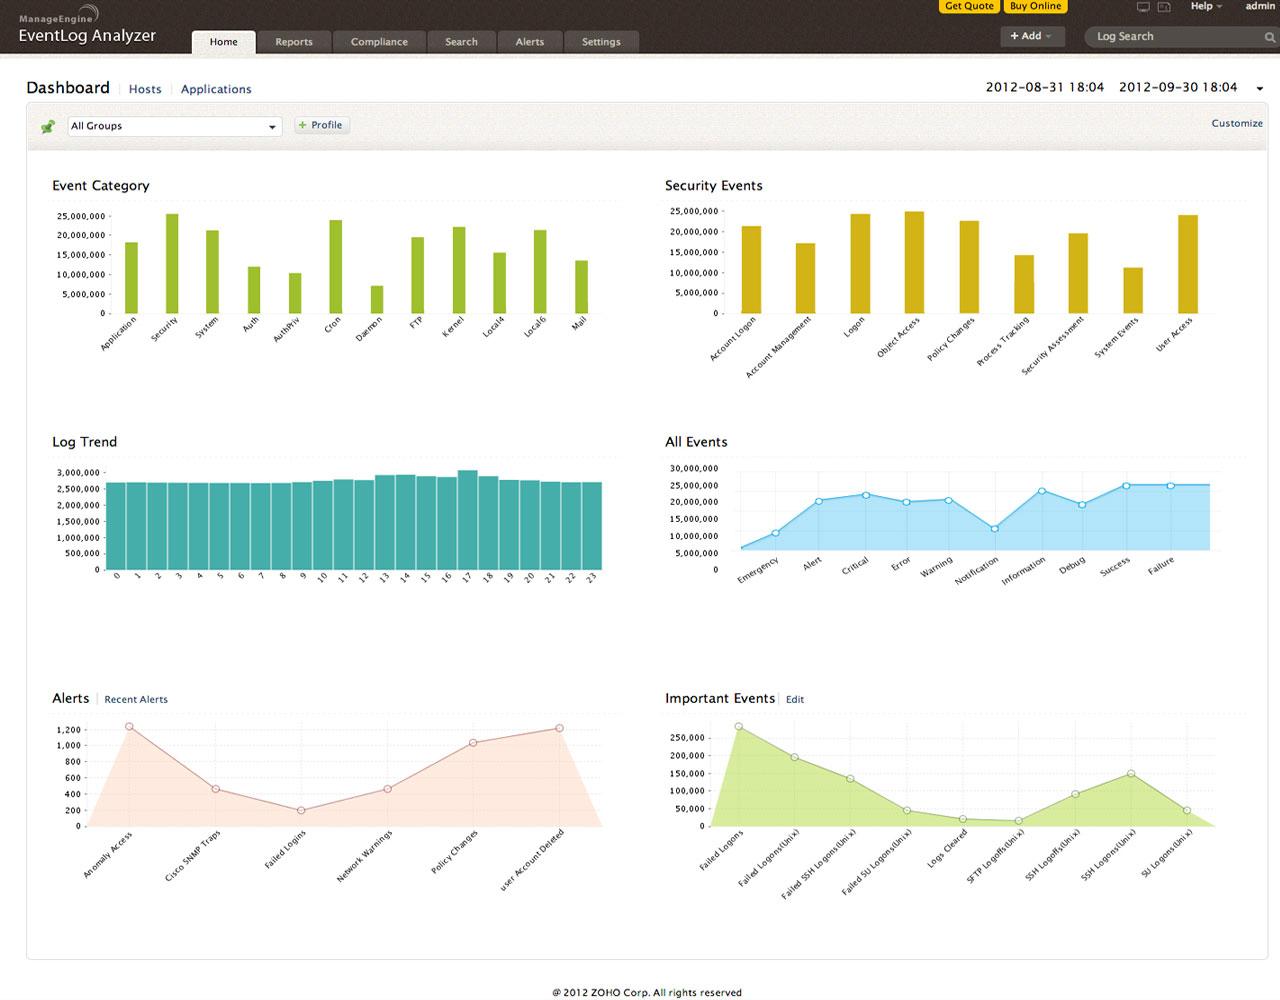 ManageEngine EventLog Analyzer Free Edition